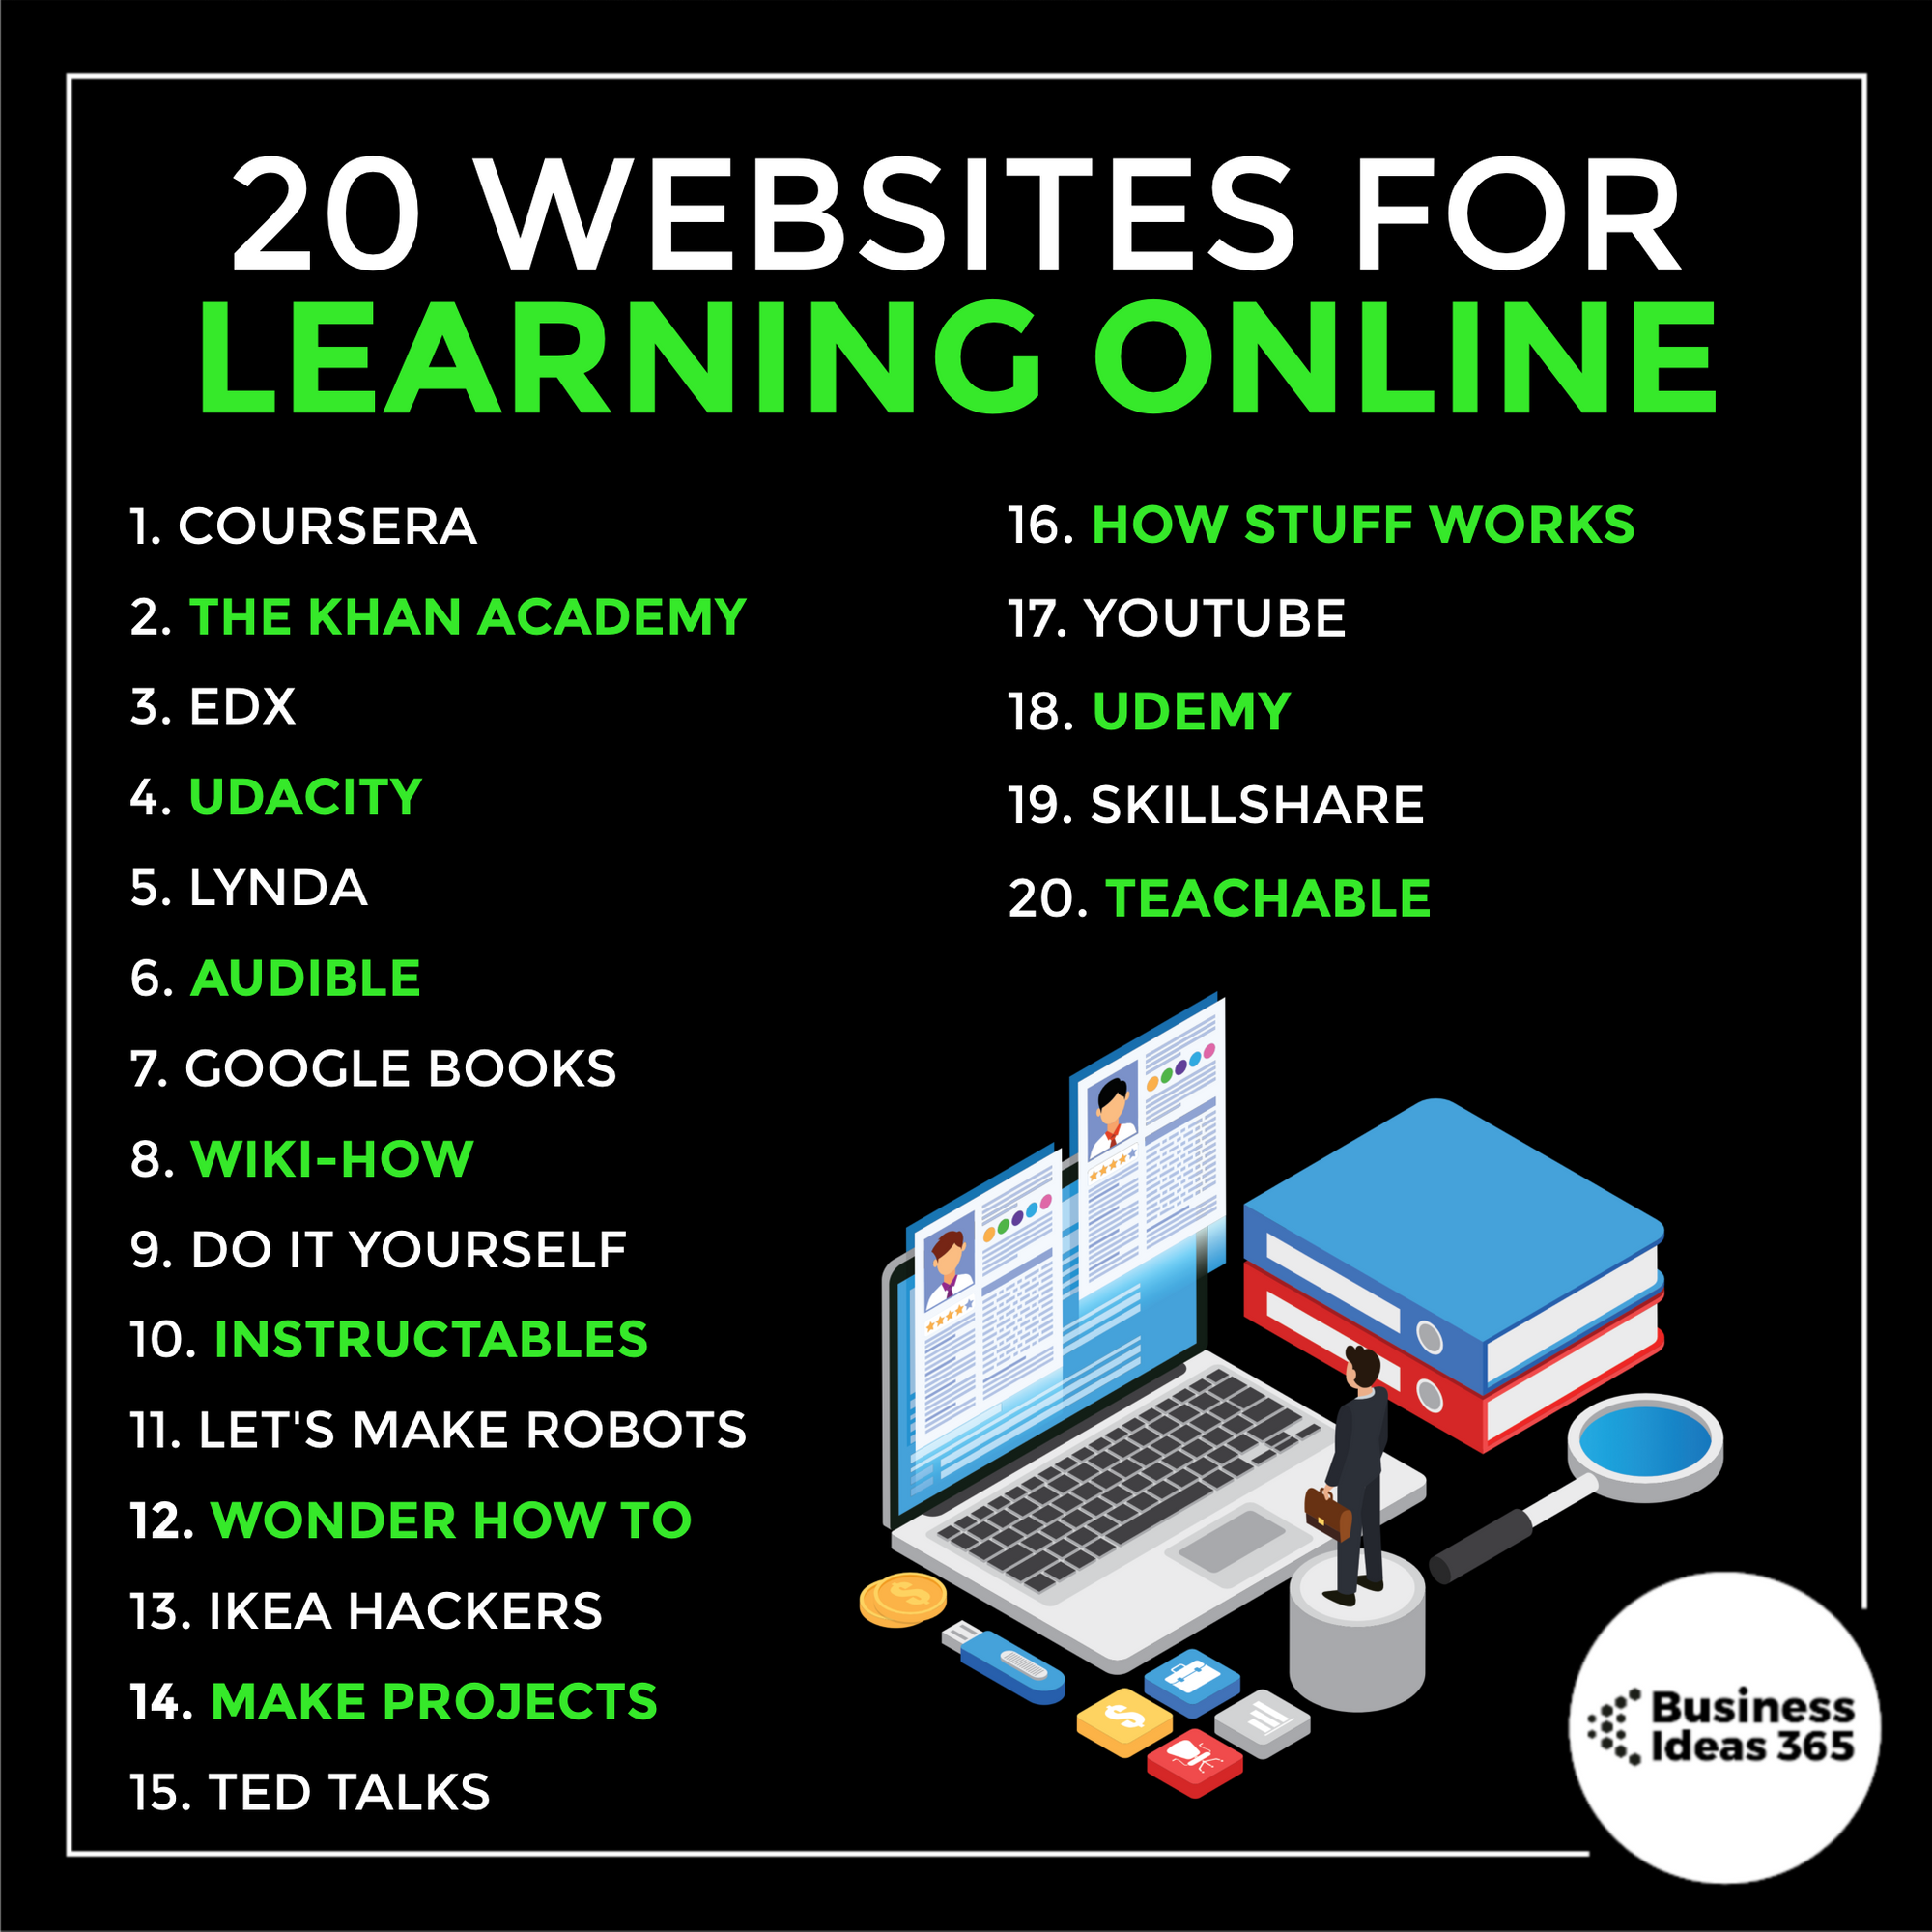 20 Websites For Learning Online In 2020 Online Learning Learning Websites Online Education